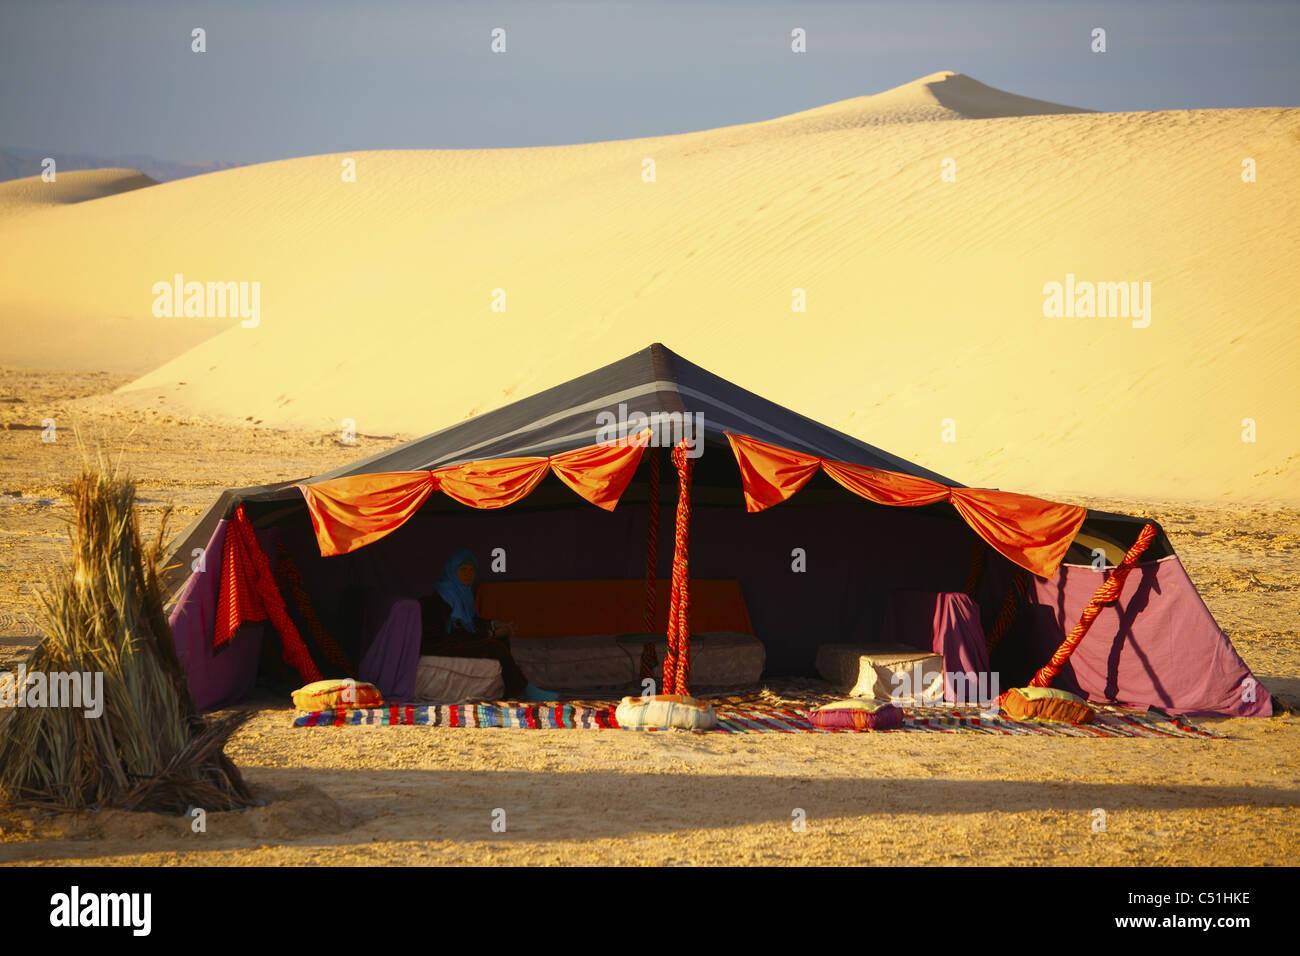 Africa Tunisia Nefta Sahara Desert Ong El Djemel Berber Tents Berber Woman & Africa Tunisia Nefta Sahara Desert Ong El Djemel Berber Tents ...